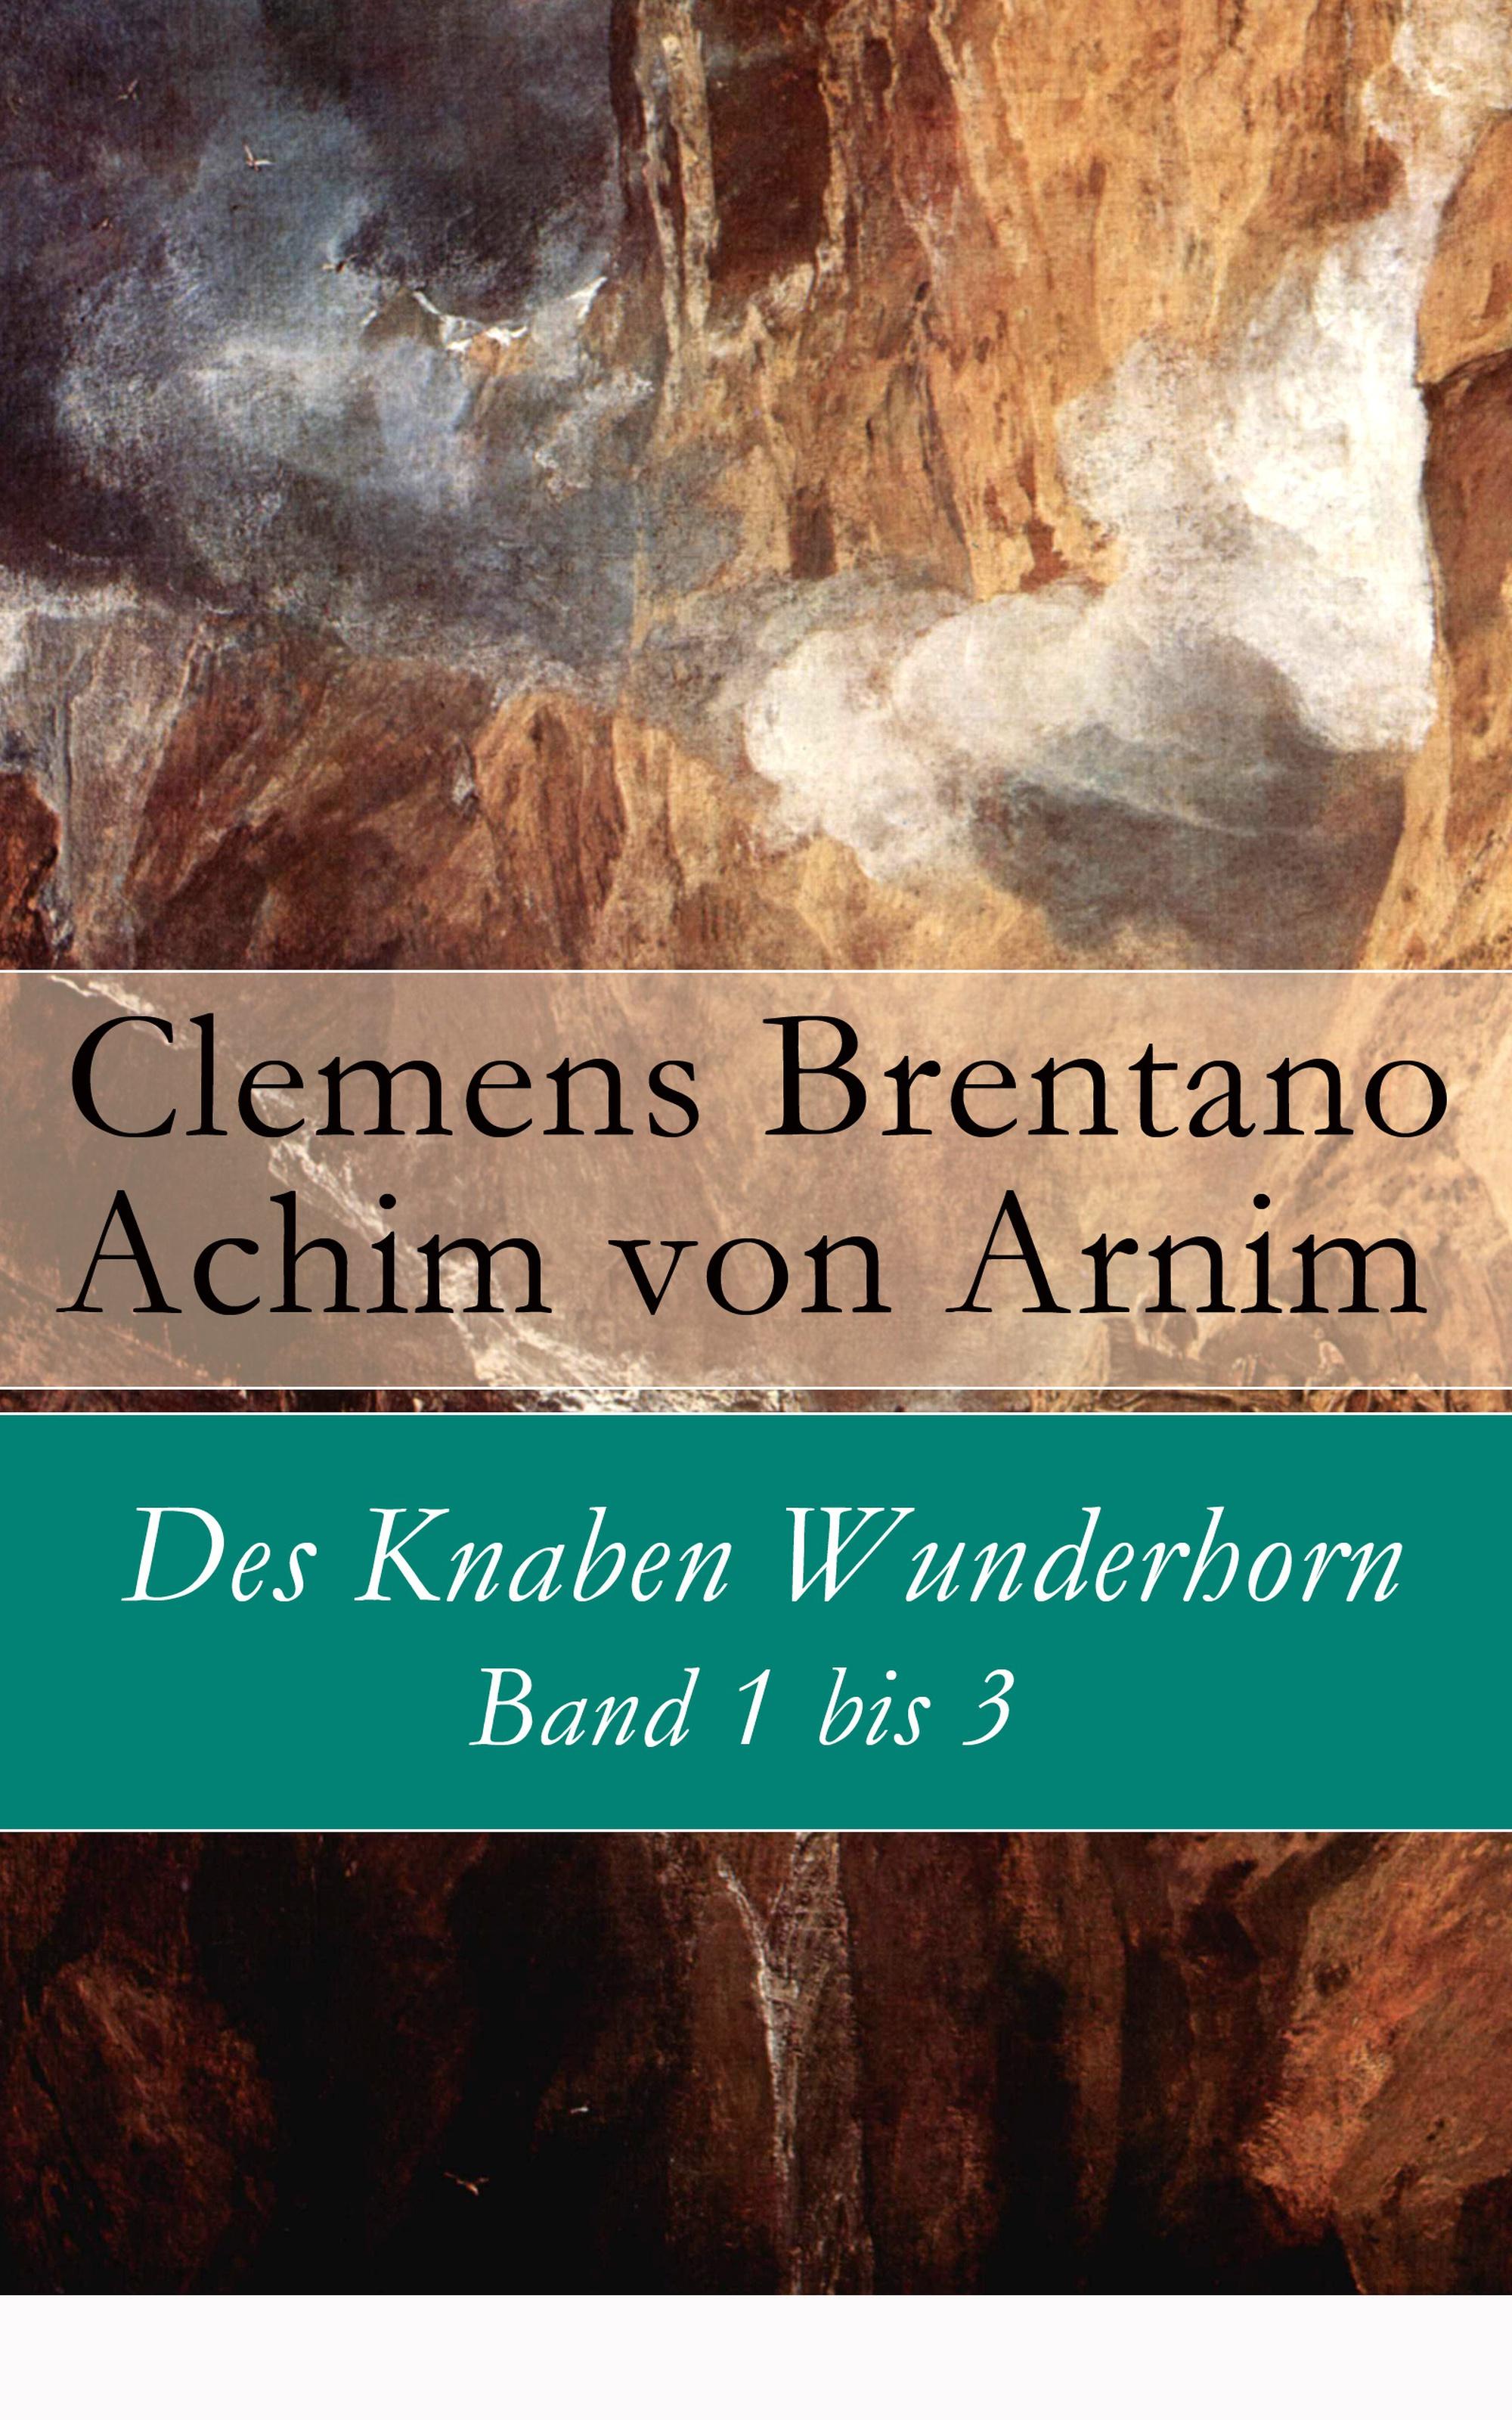 Clemens Brentano Des Knaben Wunderhorn: Band 1 bis 3 clemens brentano marchen